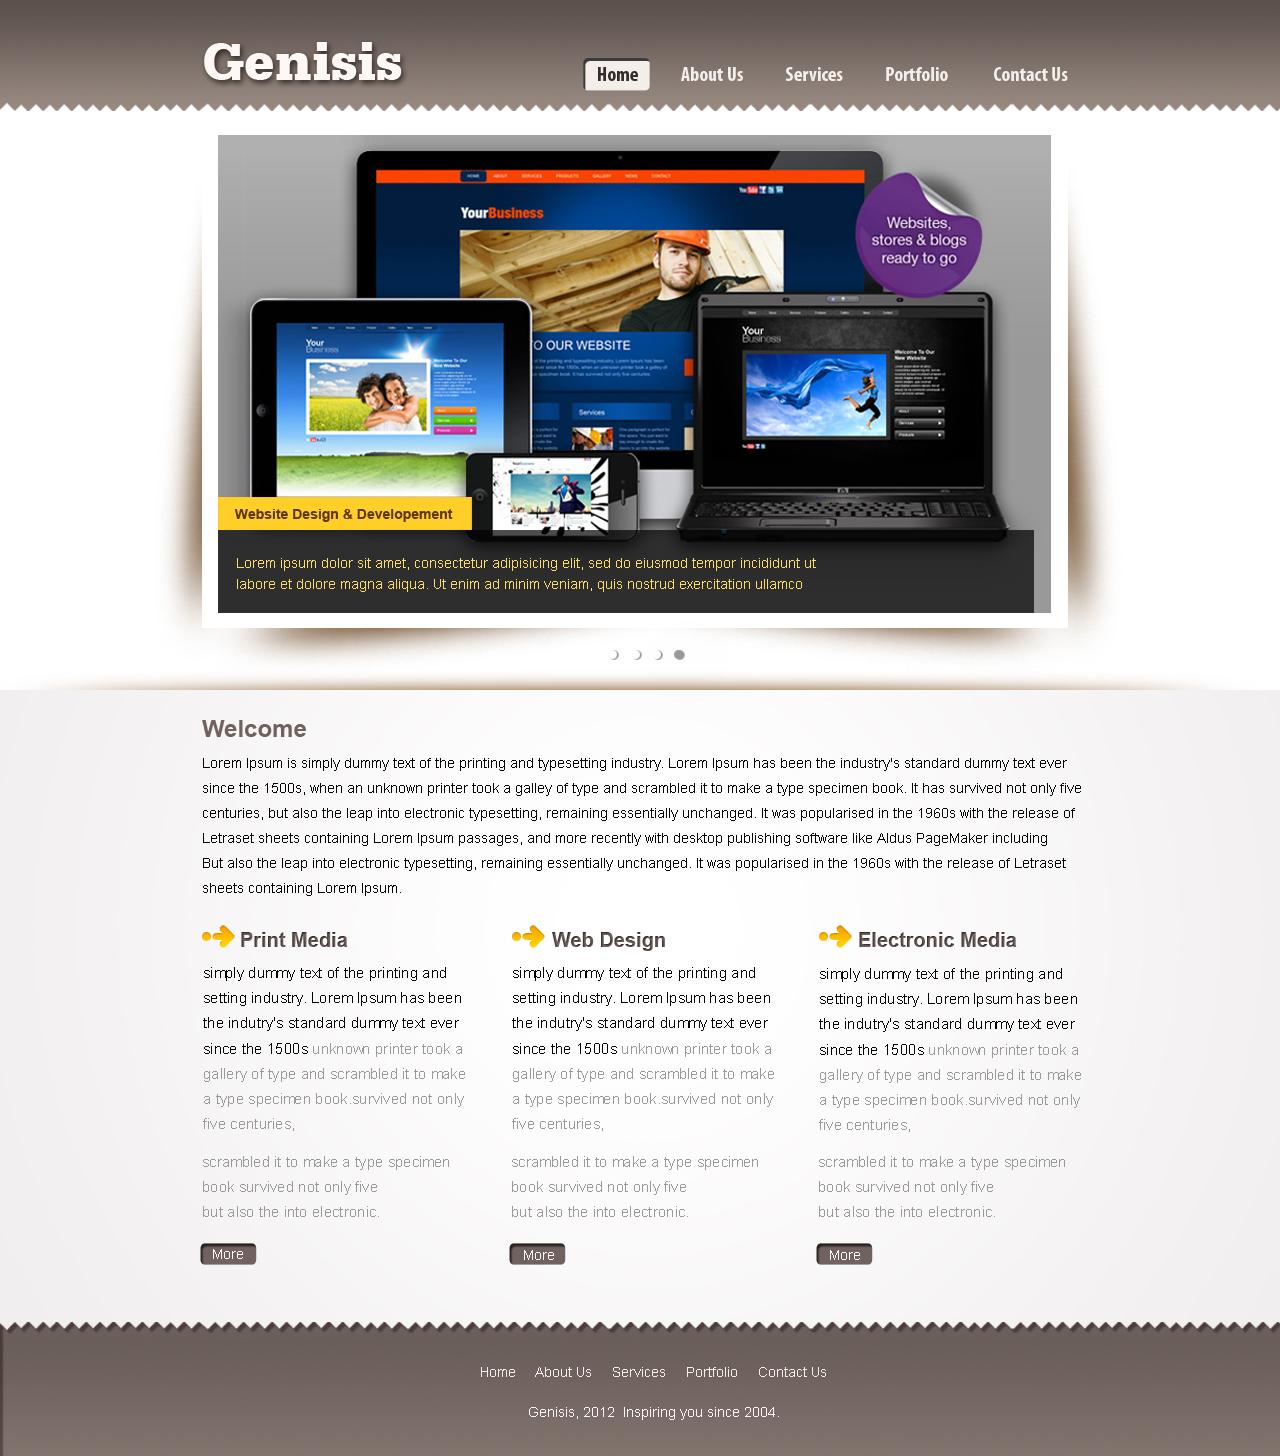 online media v s print media Print media vs electronic media - download as powerpoint presentation (ppt / pptx), pdf file (pdf), text file (txt) or view presentation slides online.